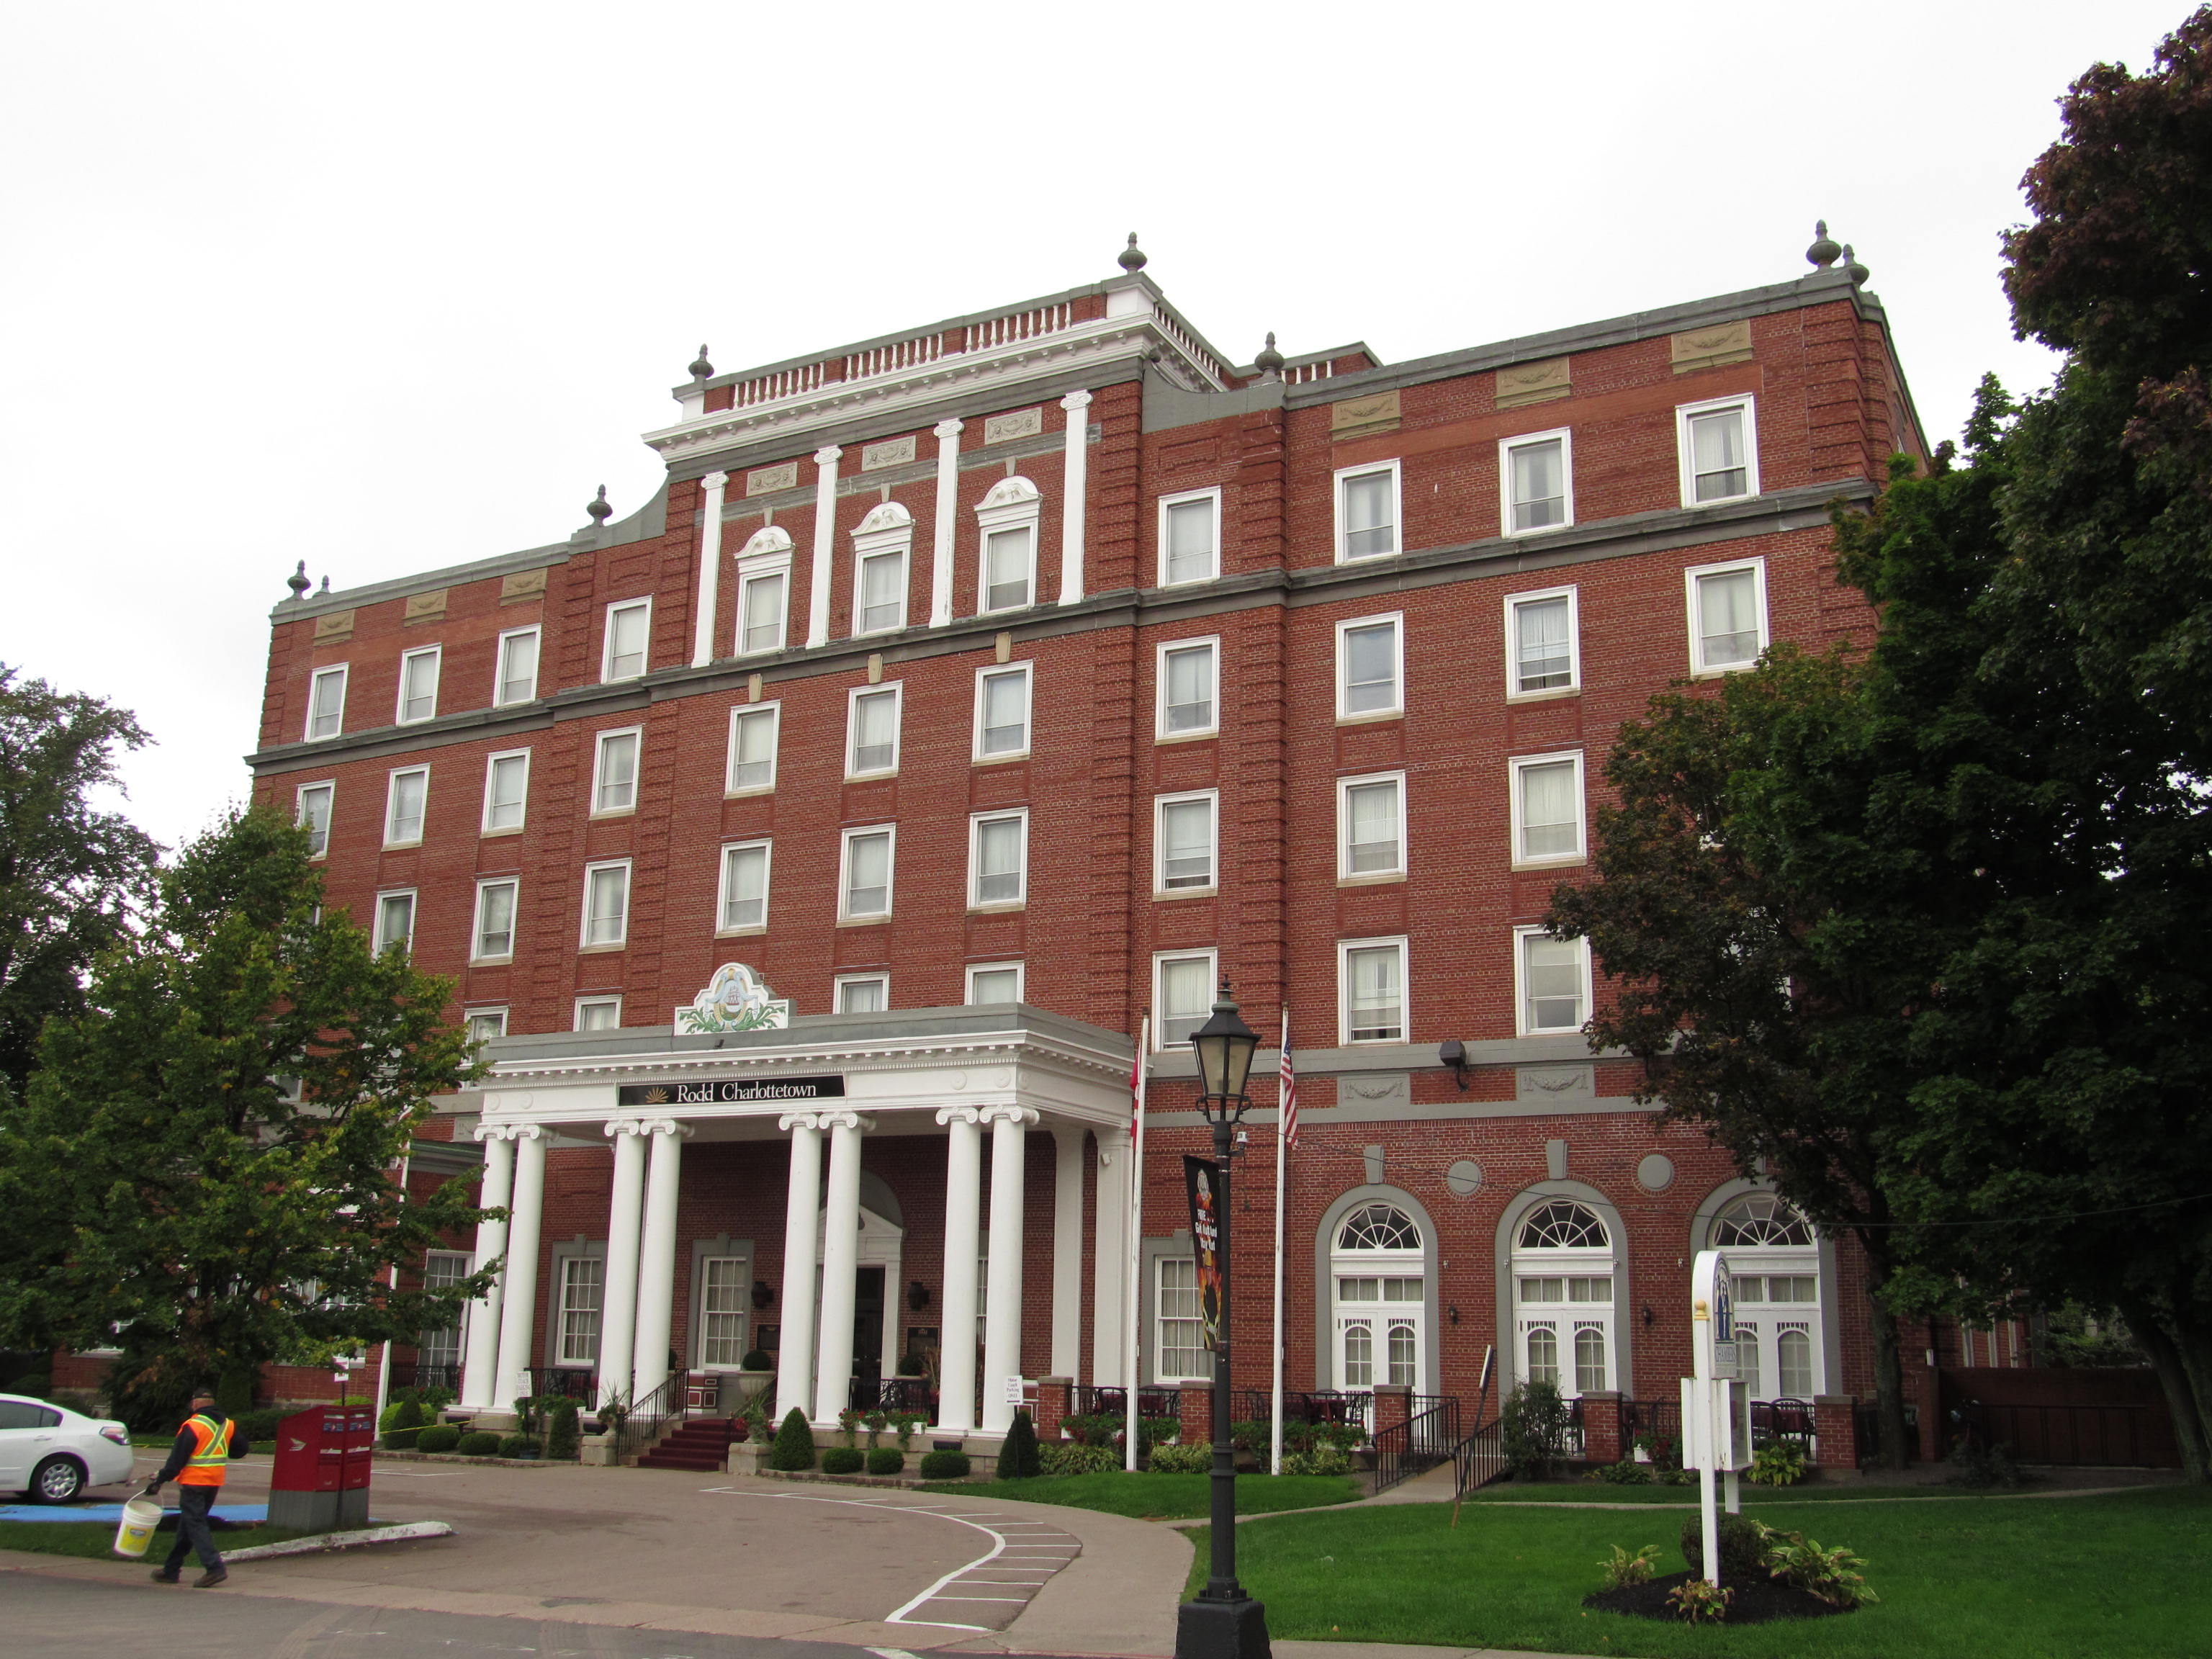 Hotel Charlottetown